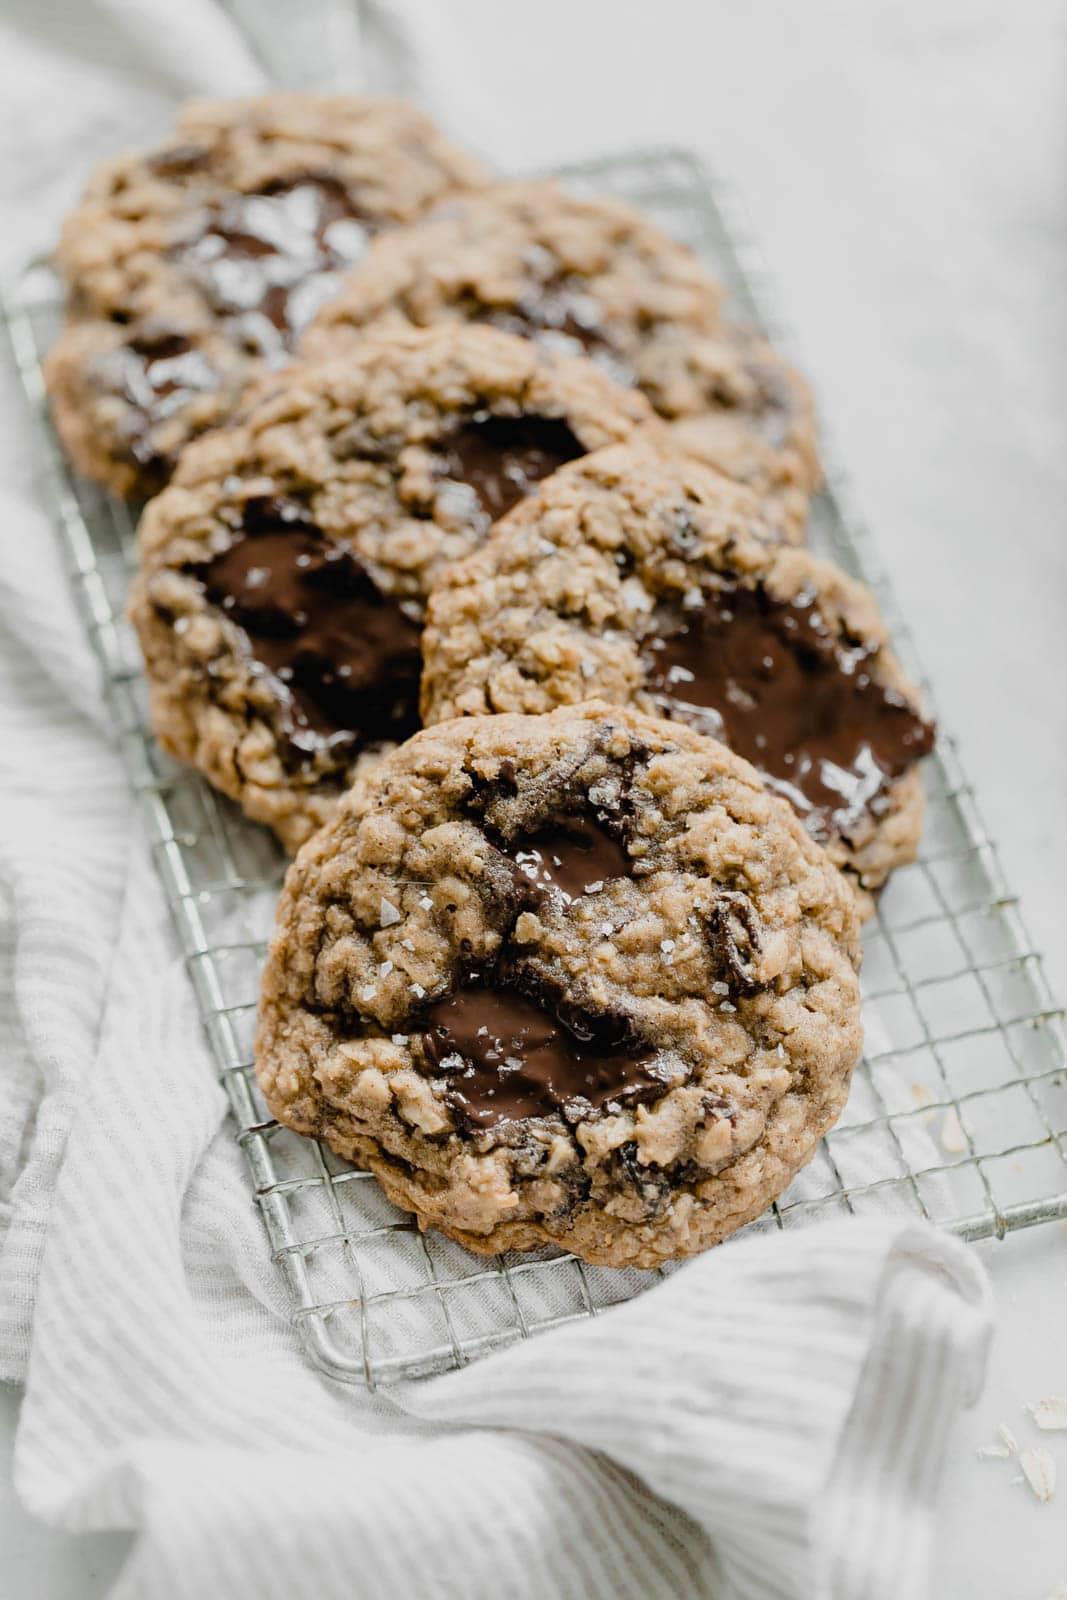 best oatmeal raisin cookies on a wire rack